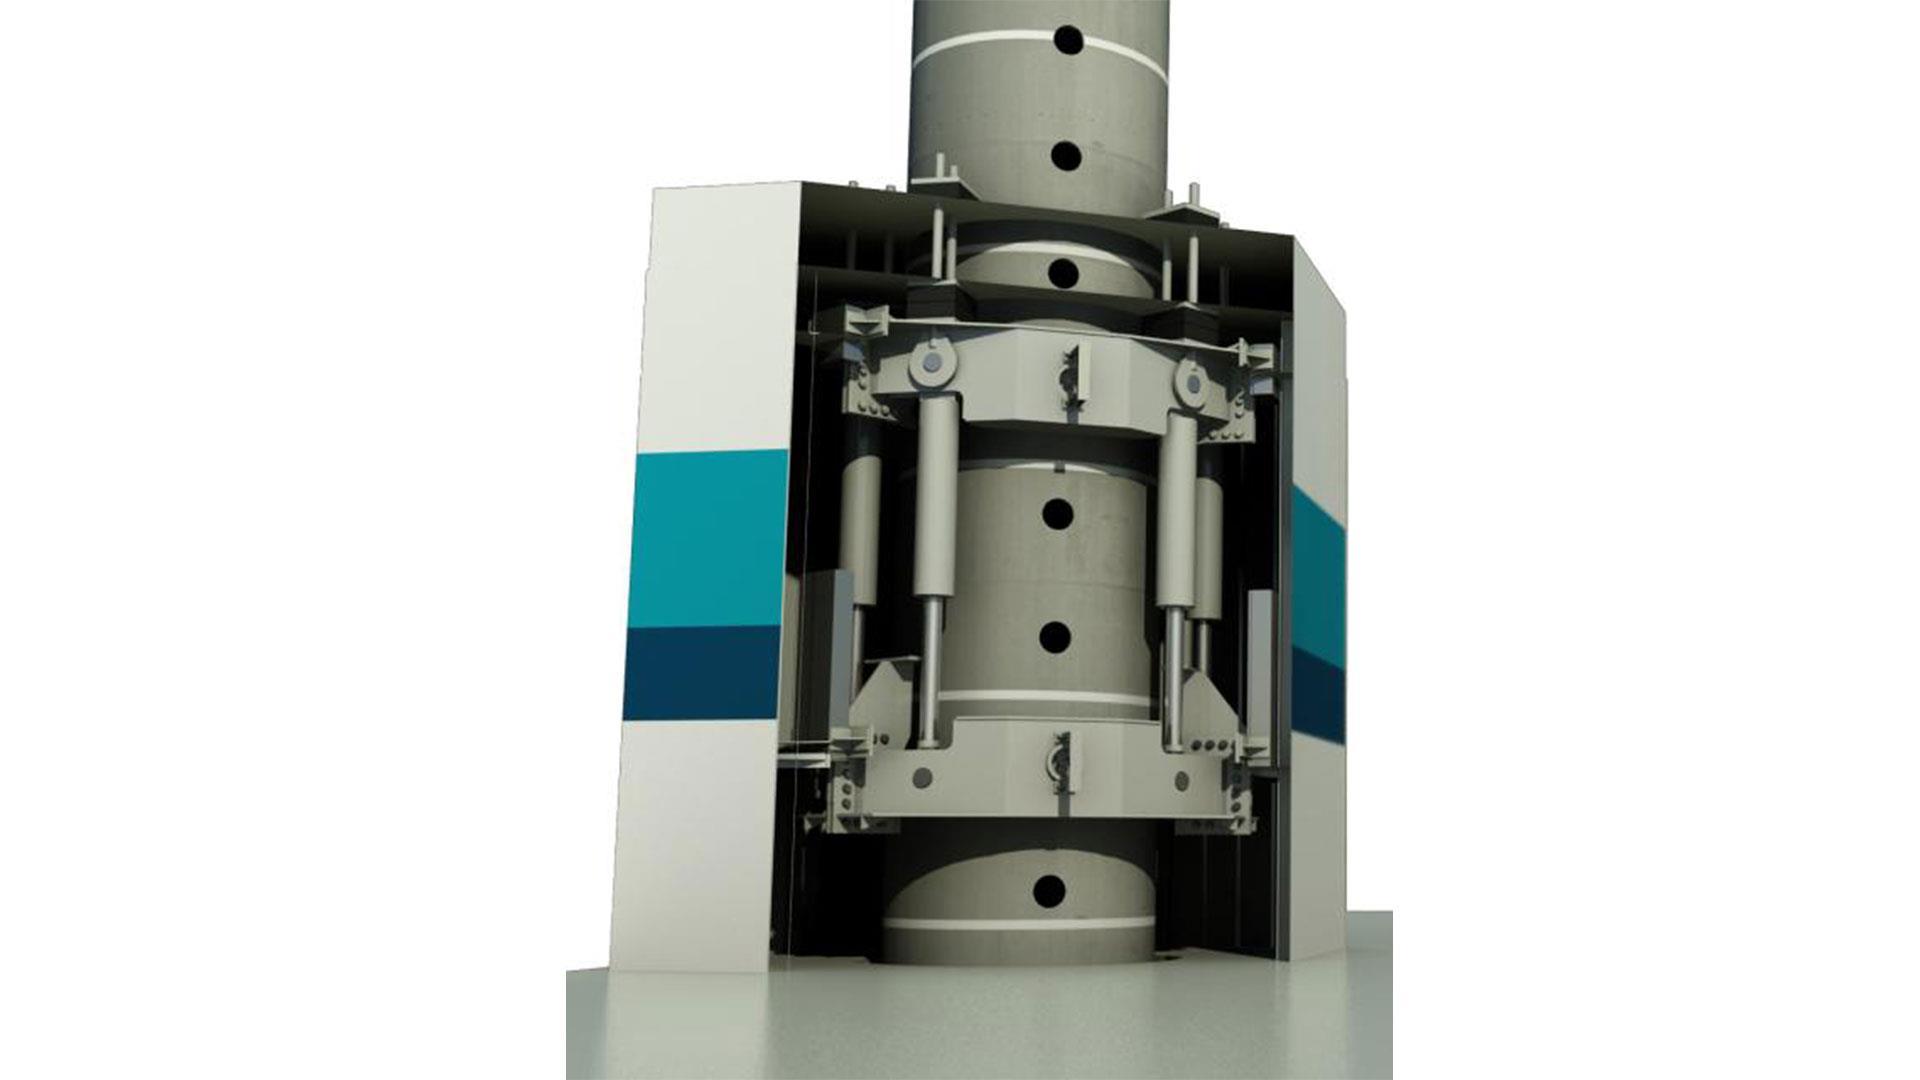 Hydraulic Jacking System Render